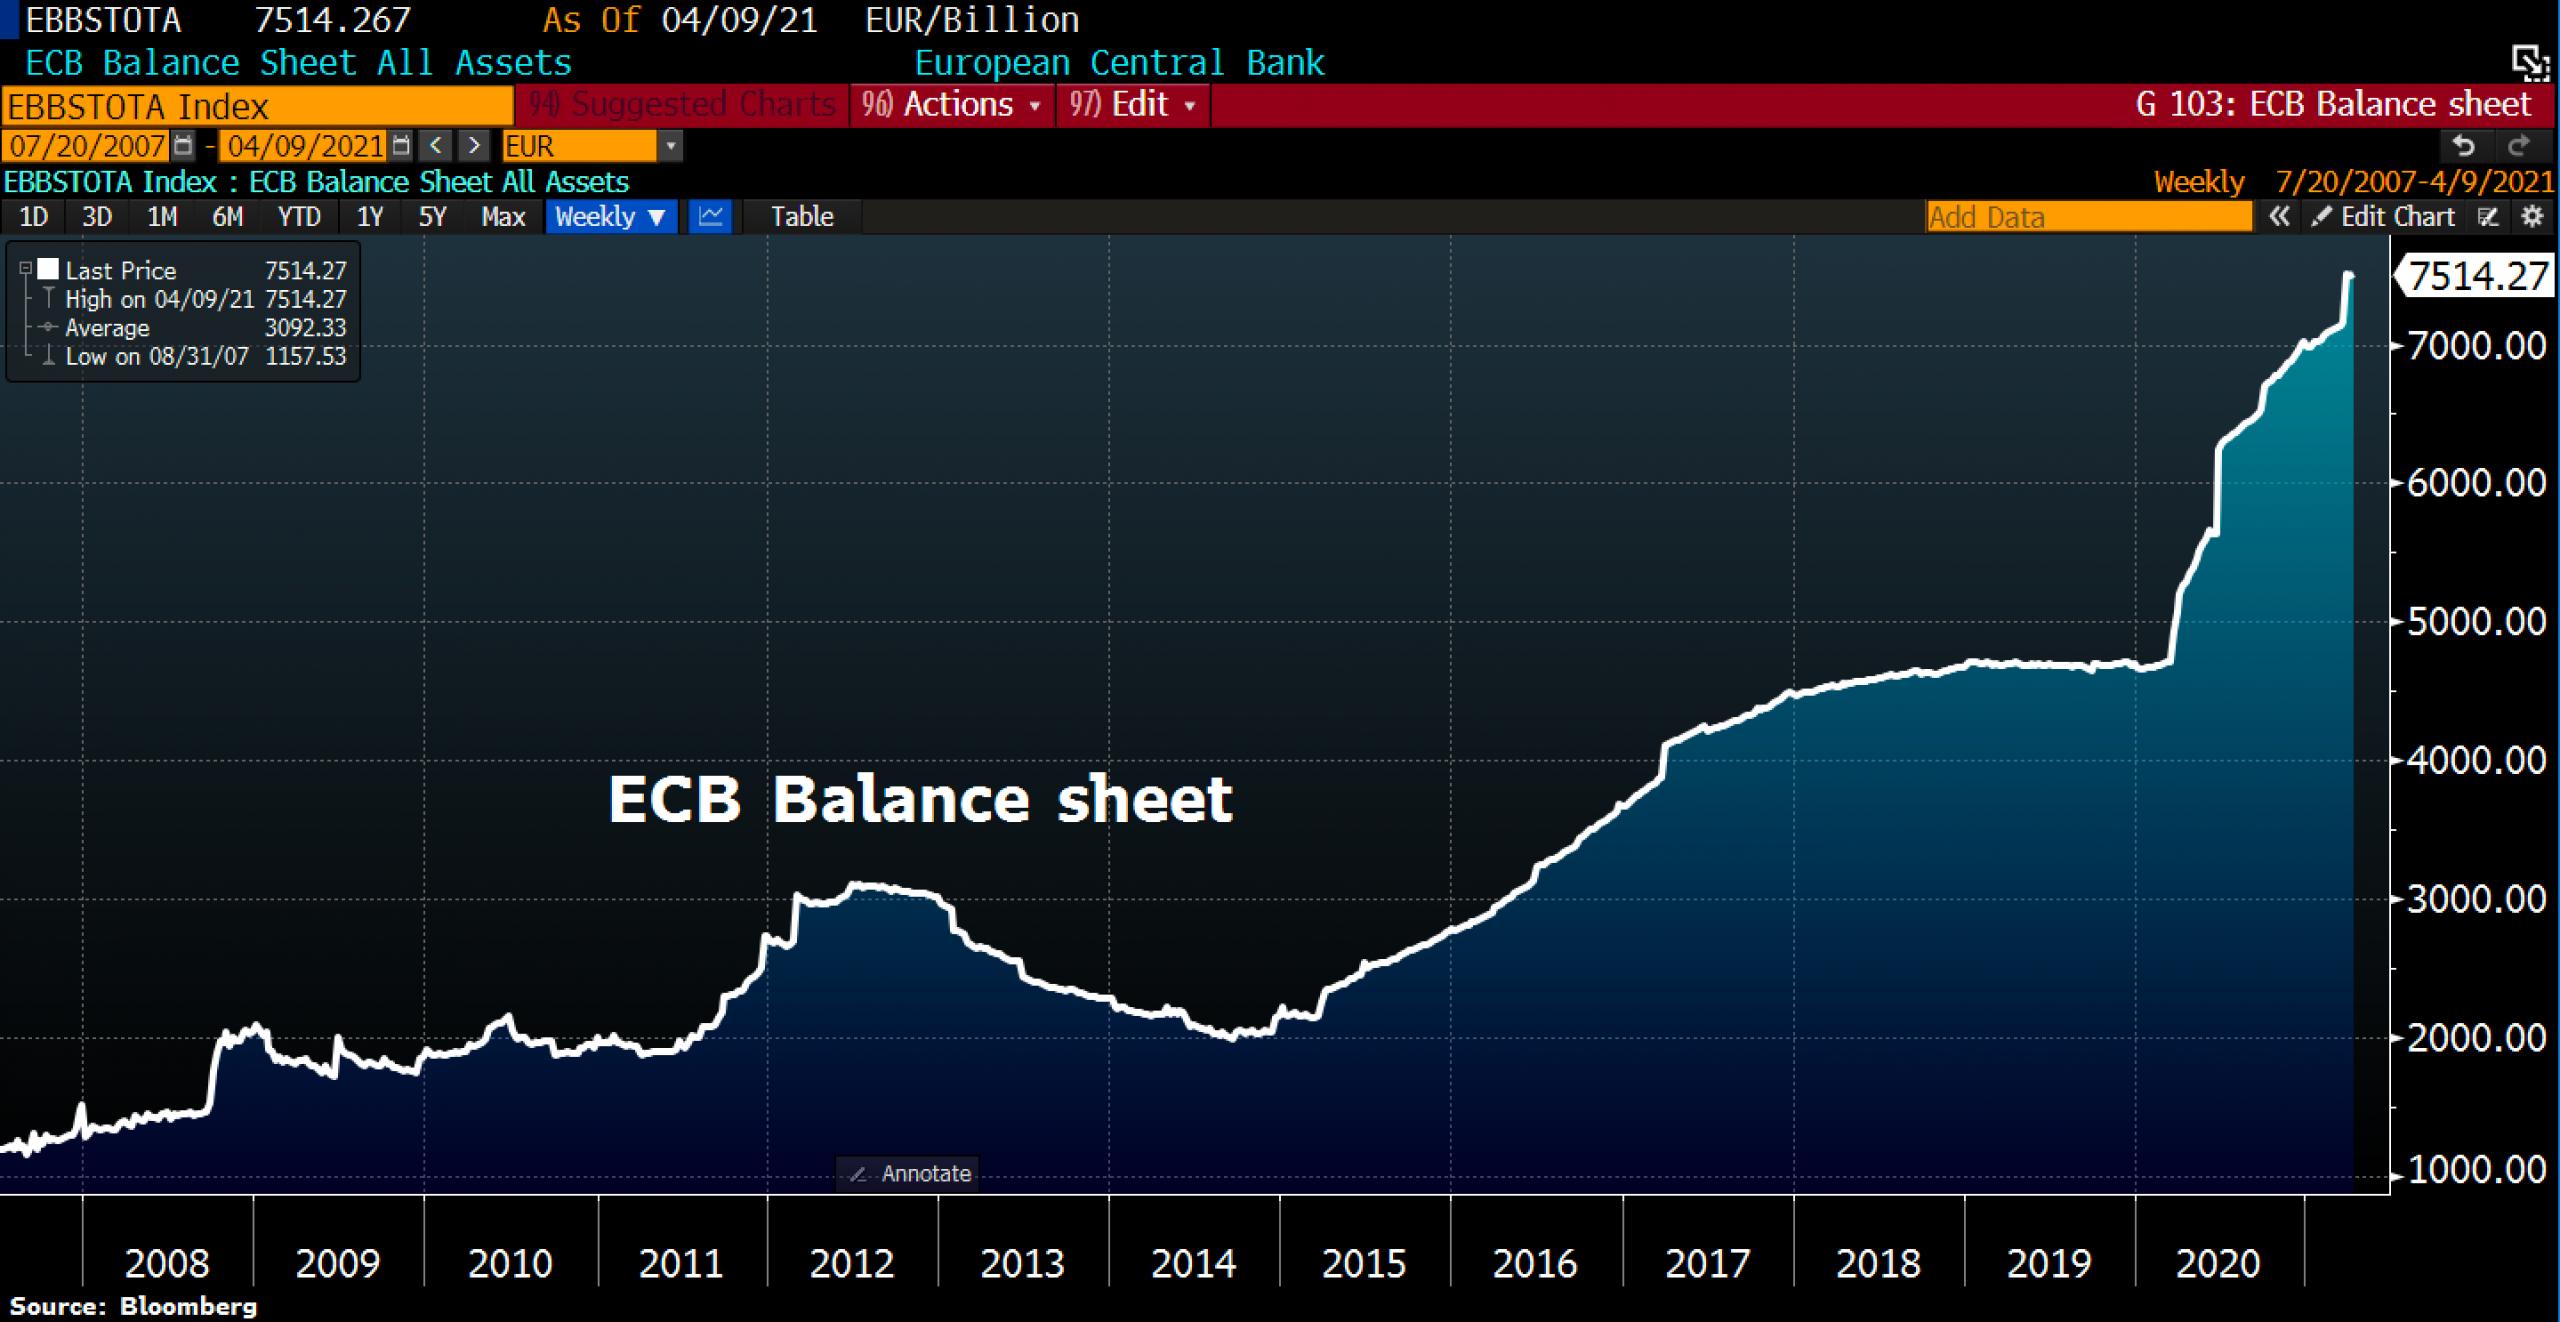 ECB Balance Sheet. © Holger Zschaepitz via Twitter @Schuldensuehner, April 13th, 2021.